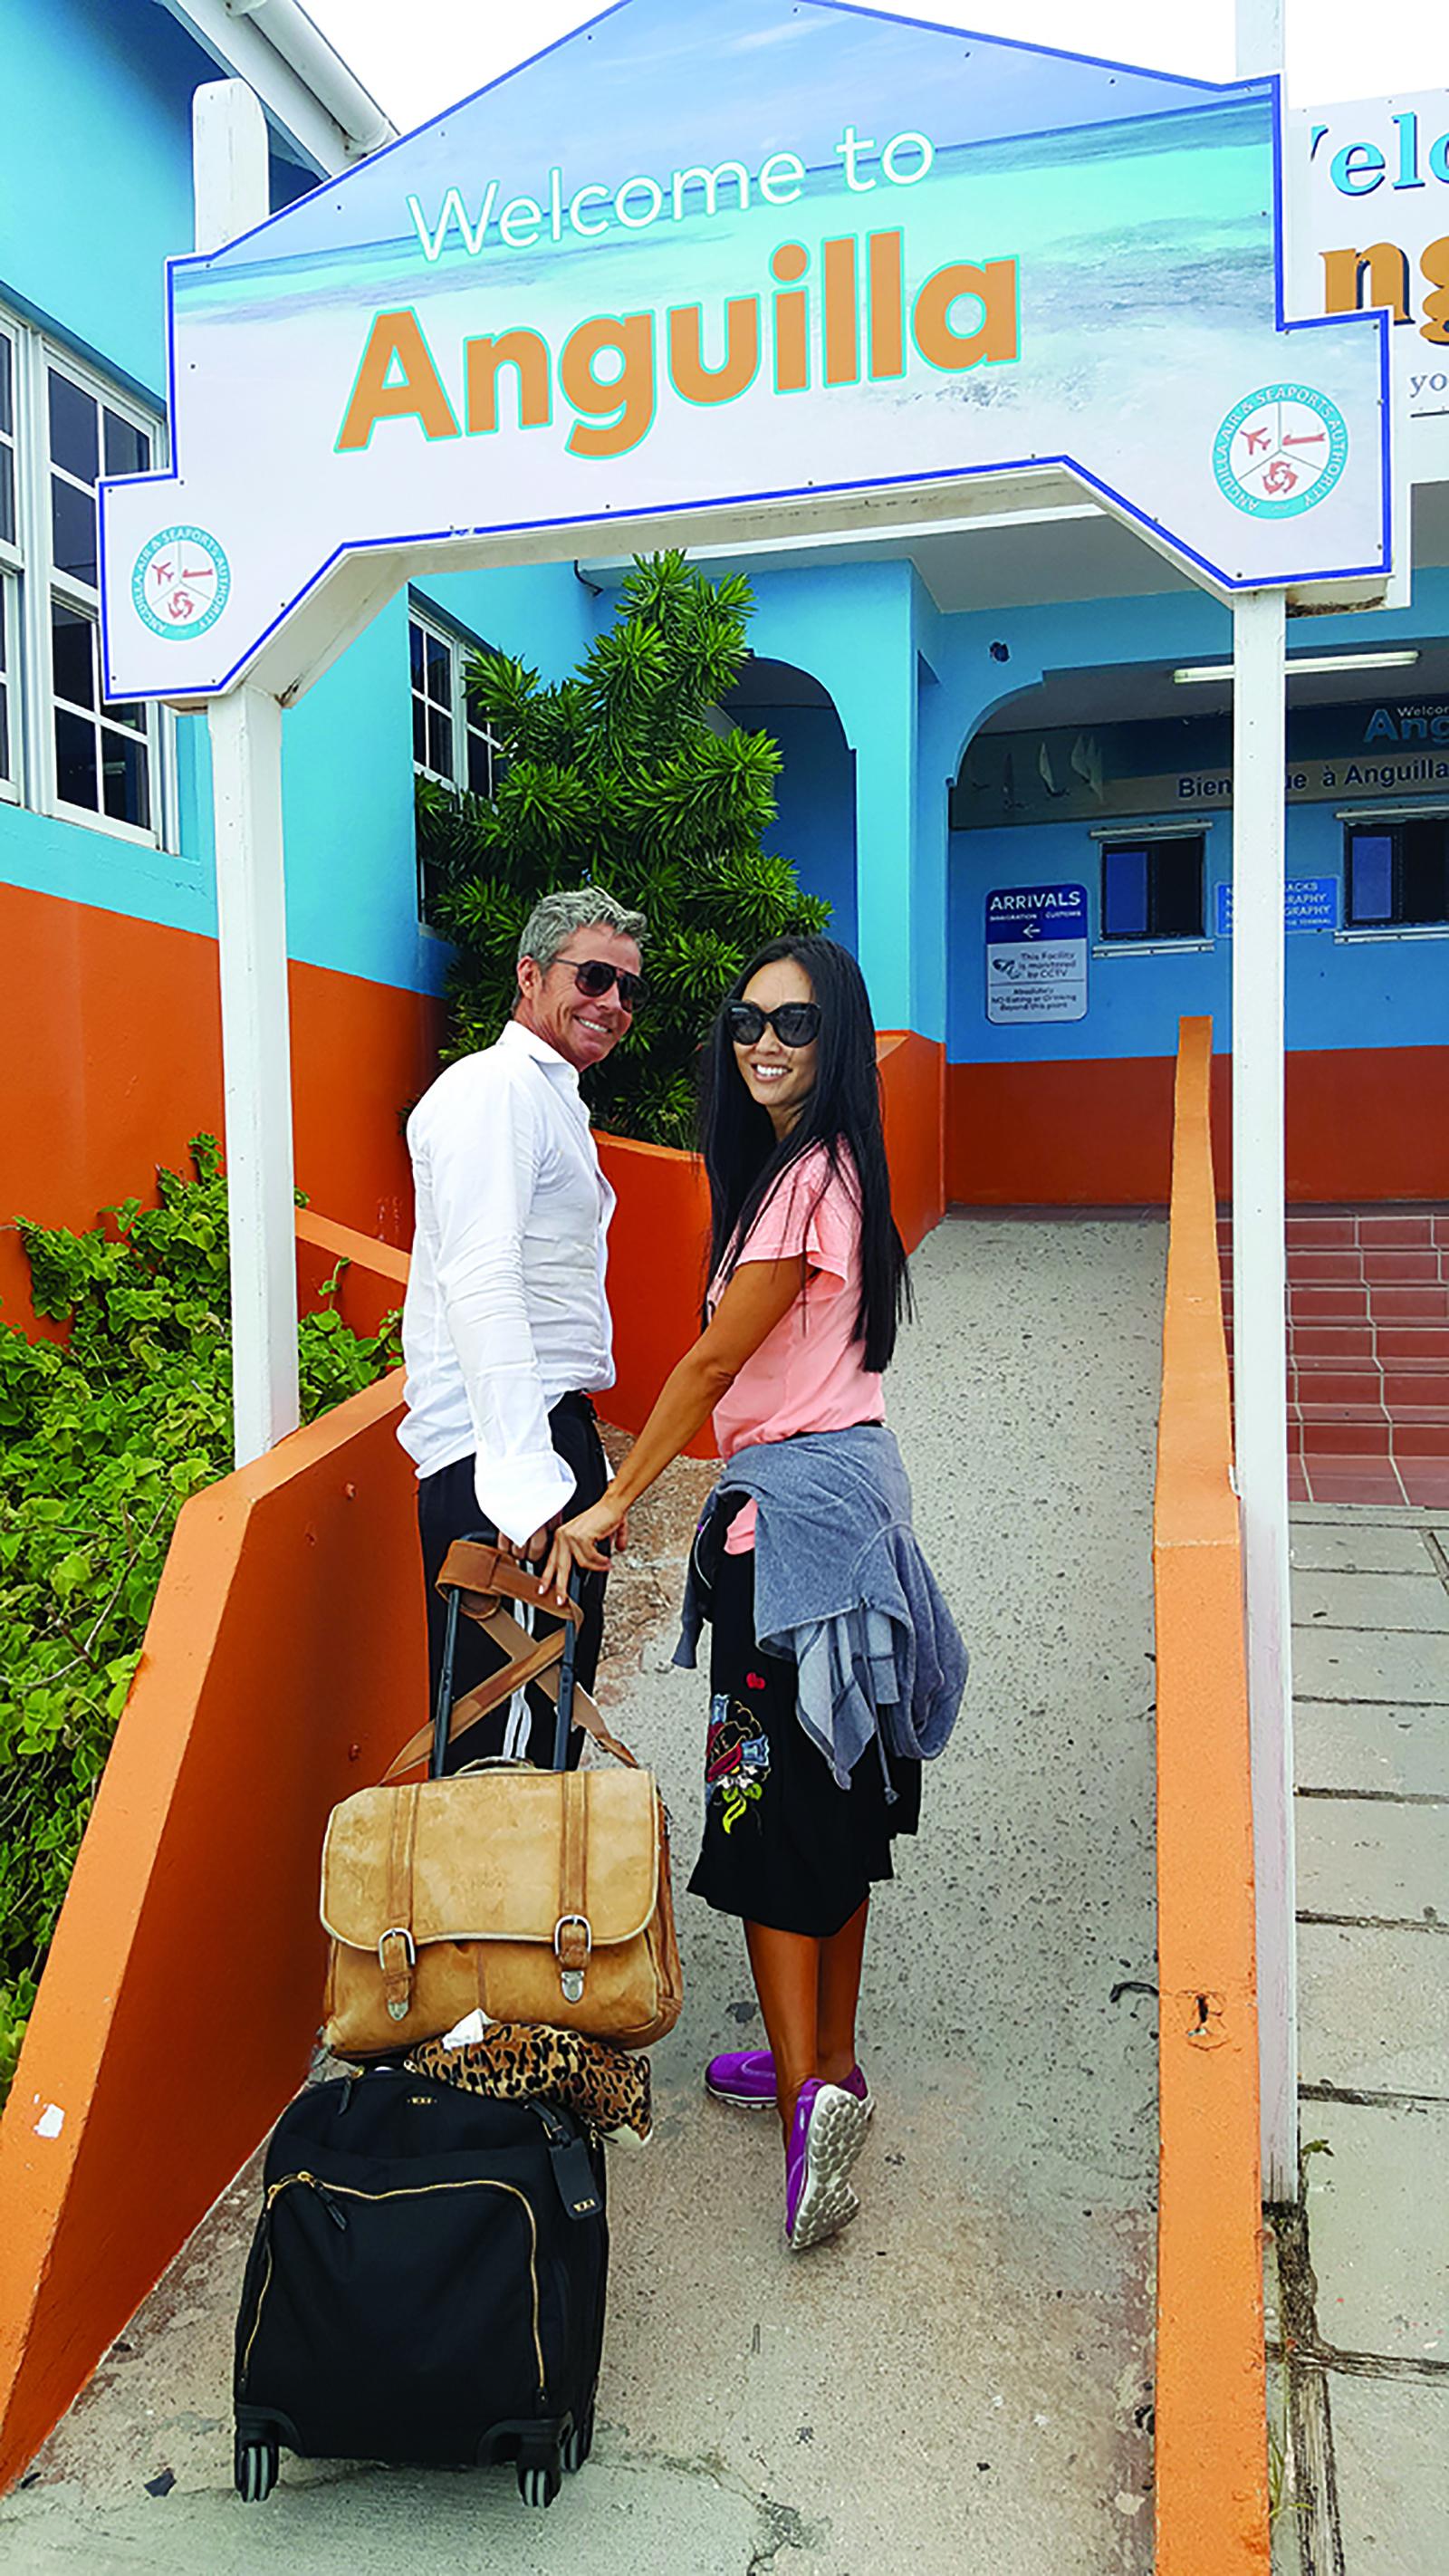 Zemi-Beach-House-Anguilla-BTS-Doug-Candace-Arriving